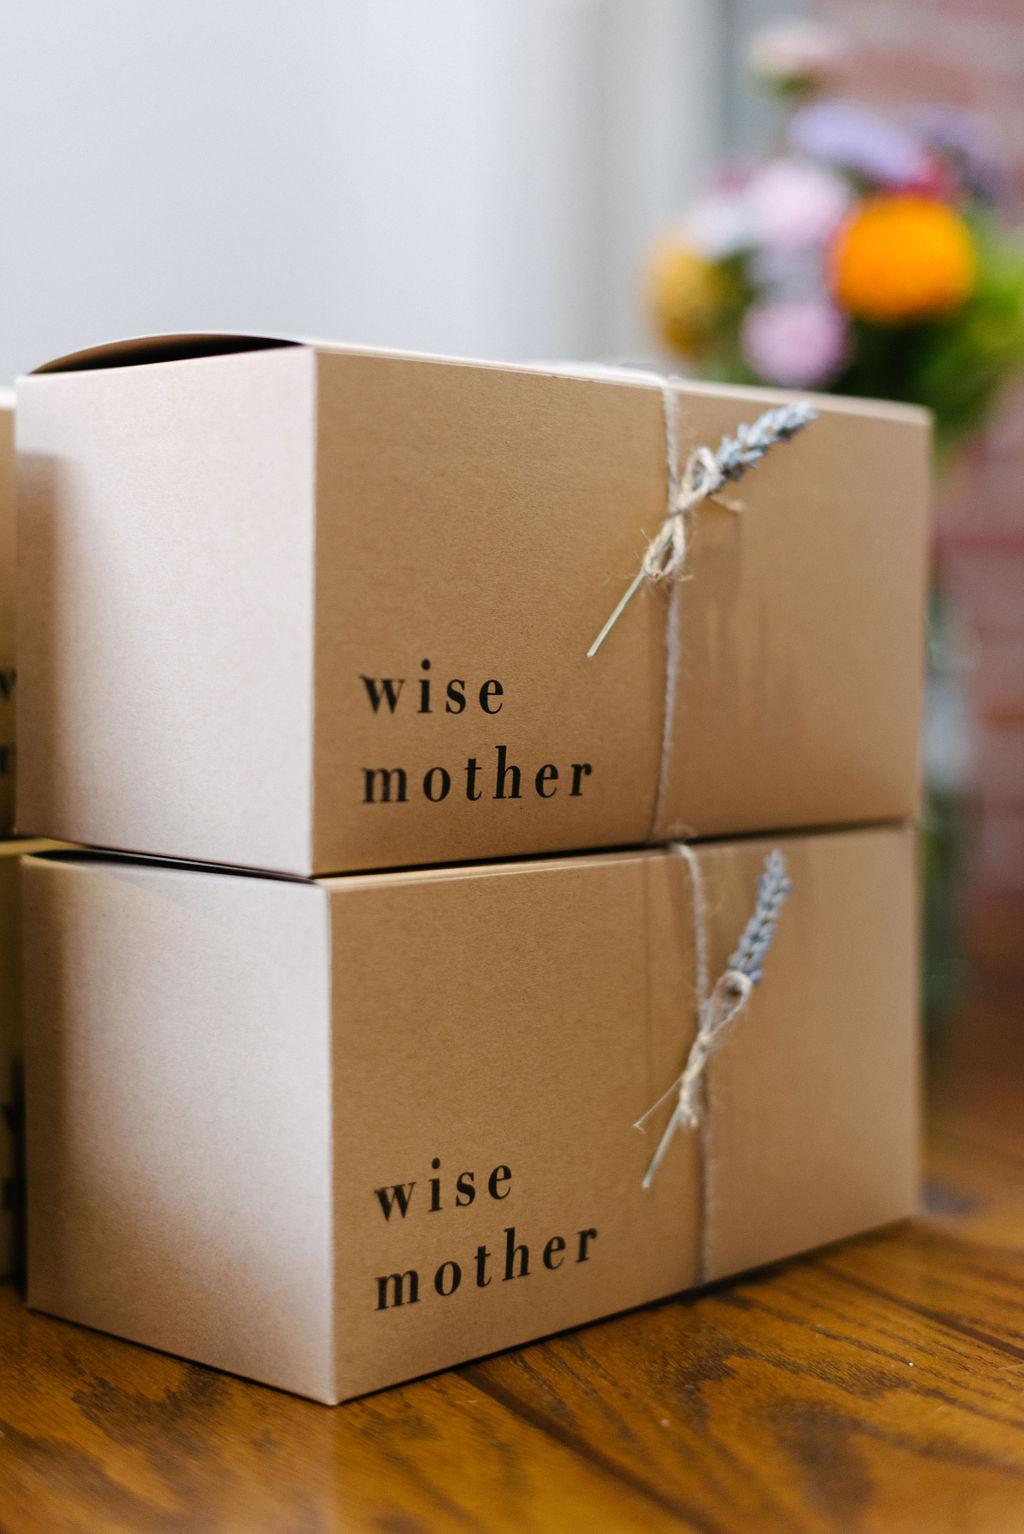 wisemother-7.jpg